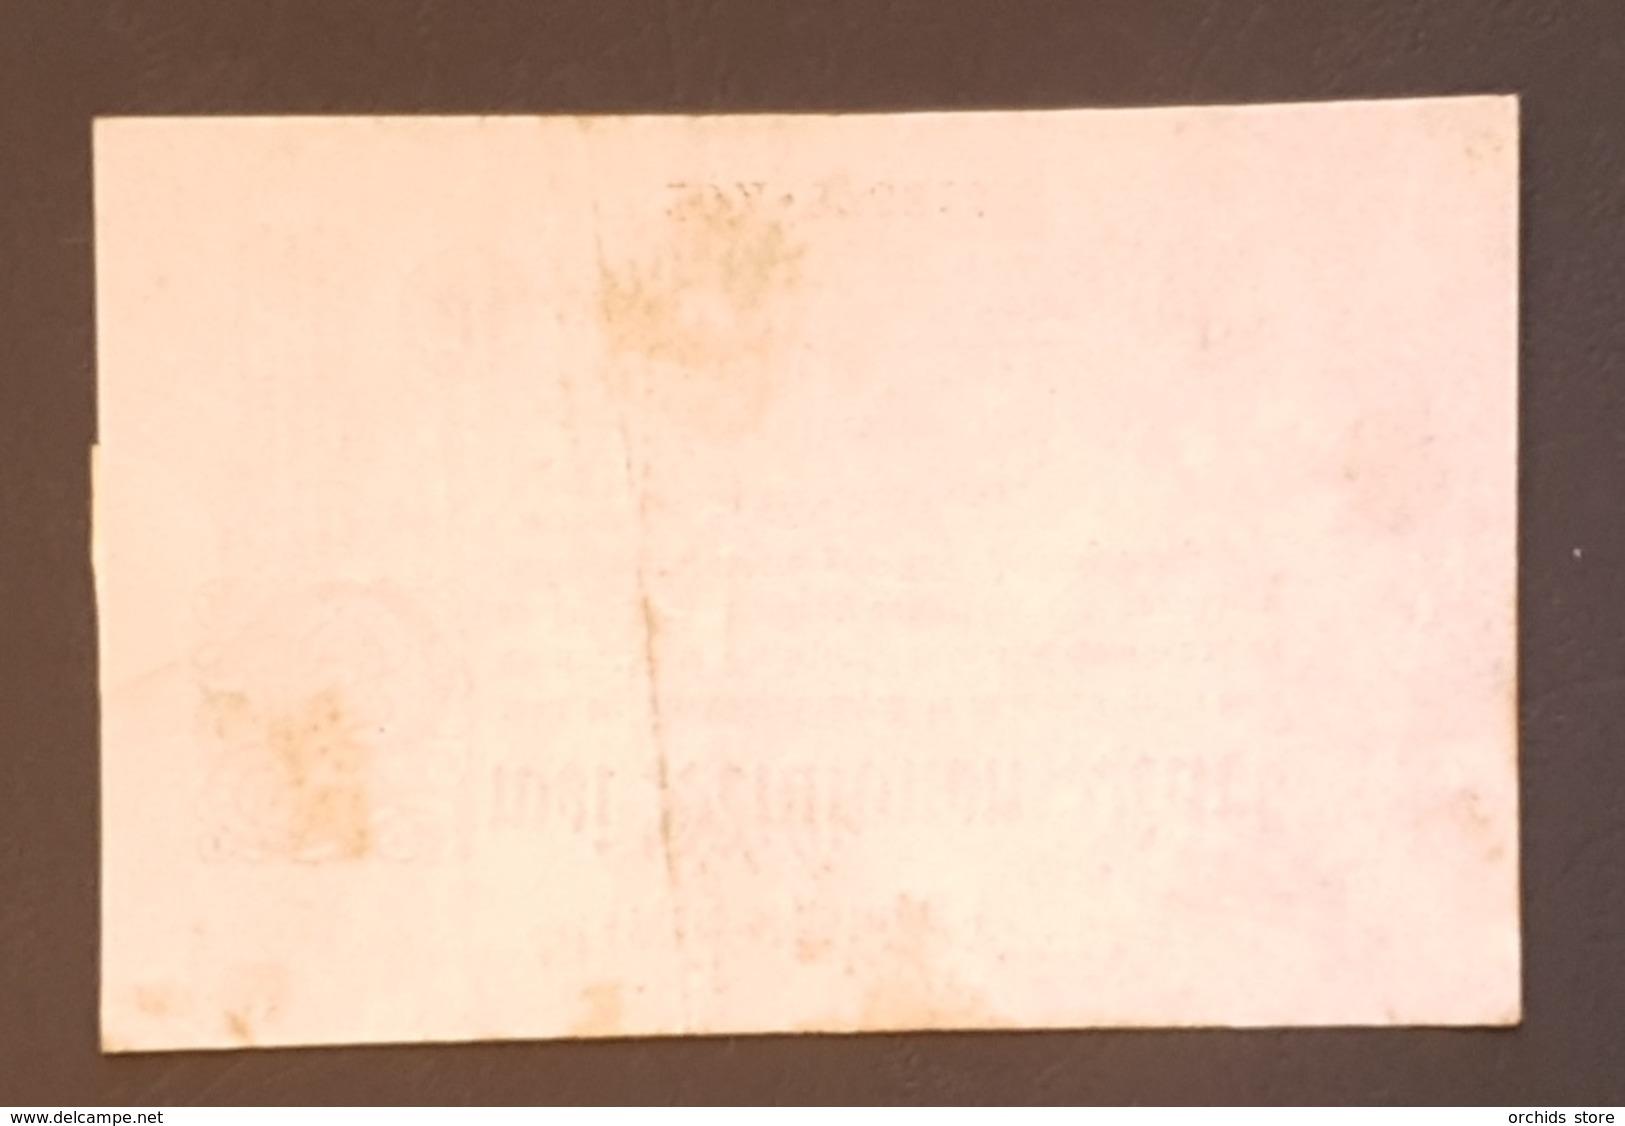 EBN8 - Germany 1923 Banknote 2 Millionen Mark Pick 103 #10A.076311 - 2 Millionen Mark